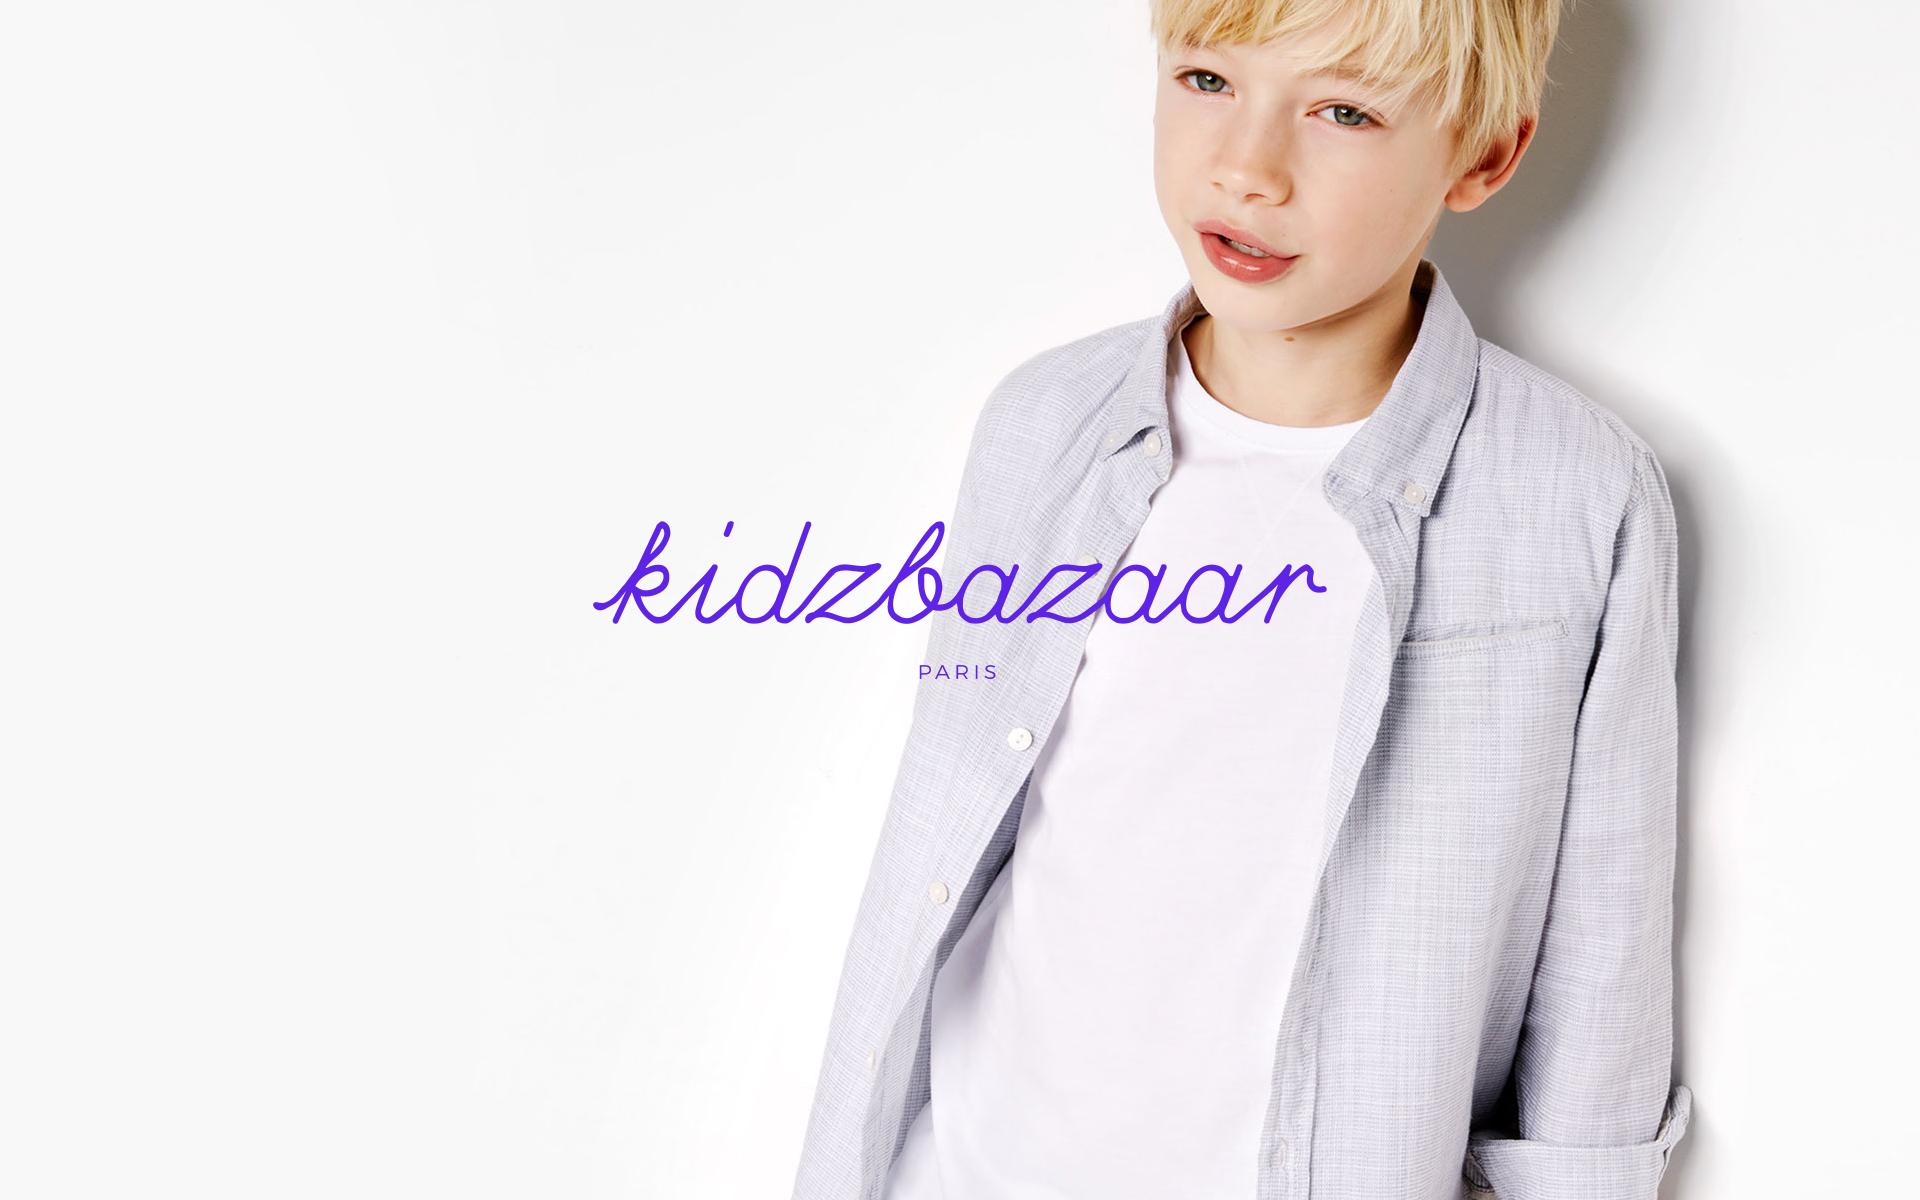 projet_logo-3kidzbazaar